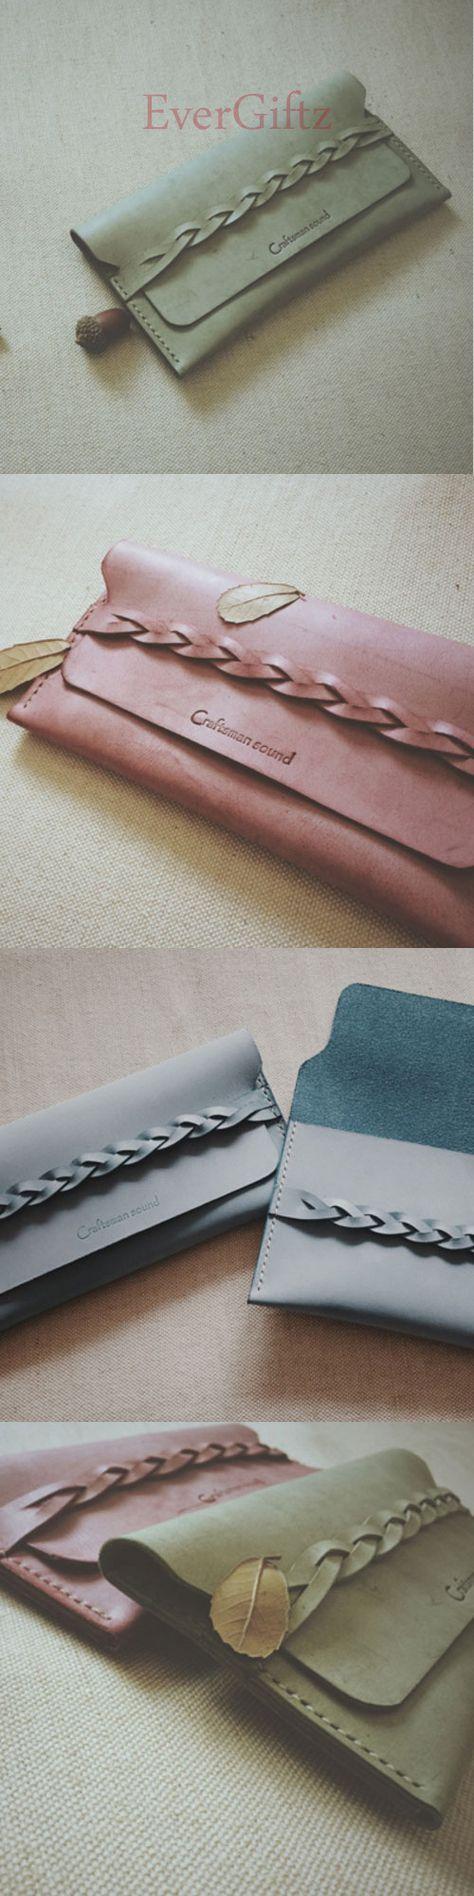 Handmade leather vintage braided women long wallet clutch phone purse wallet #purses